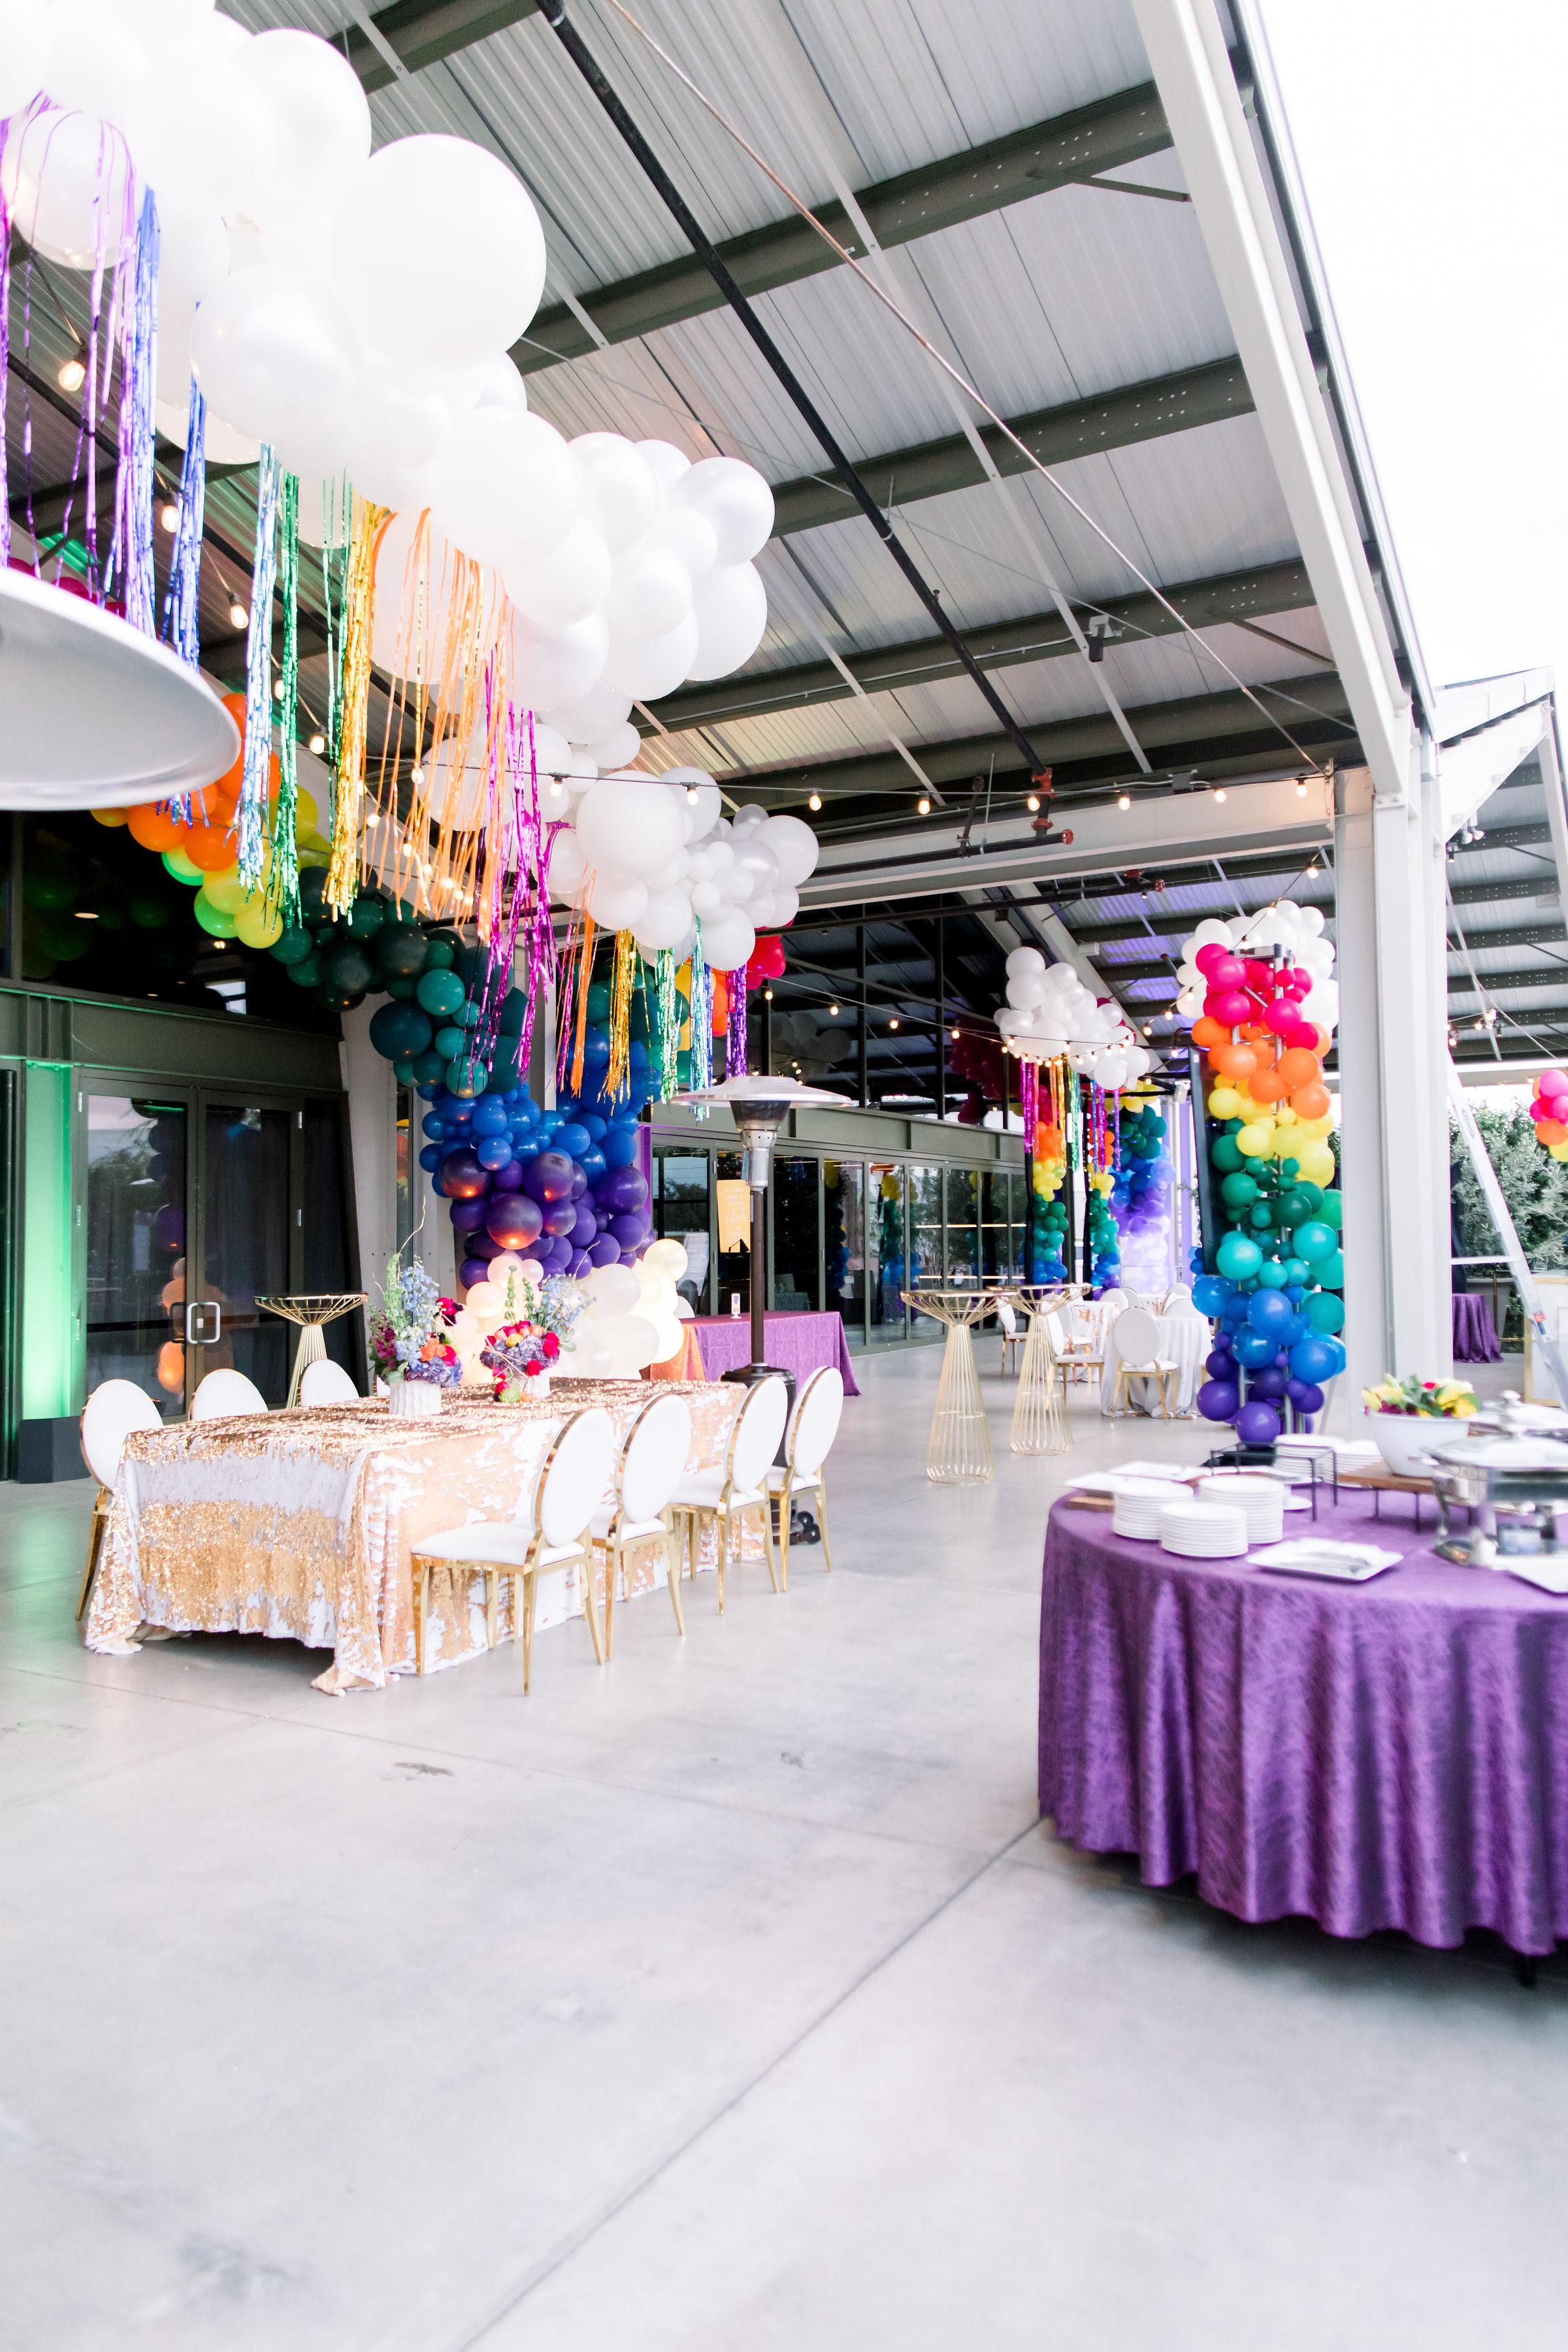 10 balloon clouds rainbow bat mitzvah party mermaid sequin linen rainbow balloon garland column Life Design Events photos by Stephanie Heymann Photography.jpg